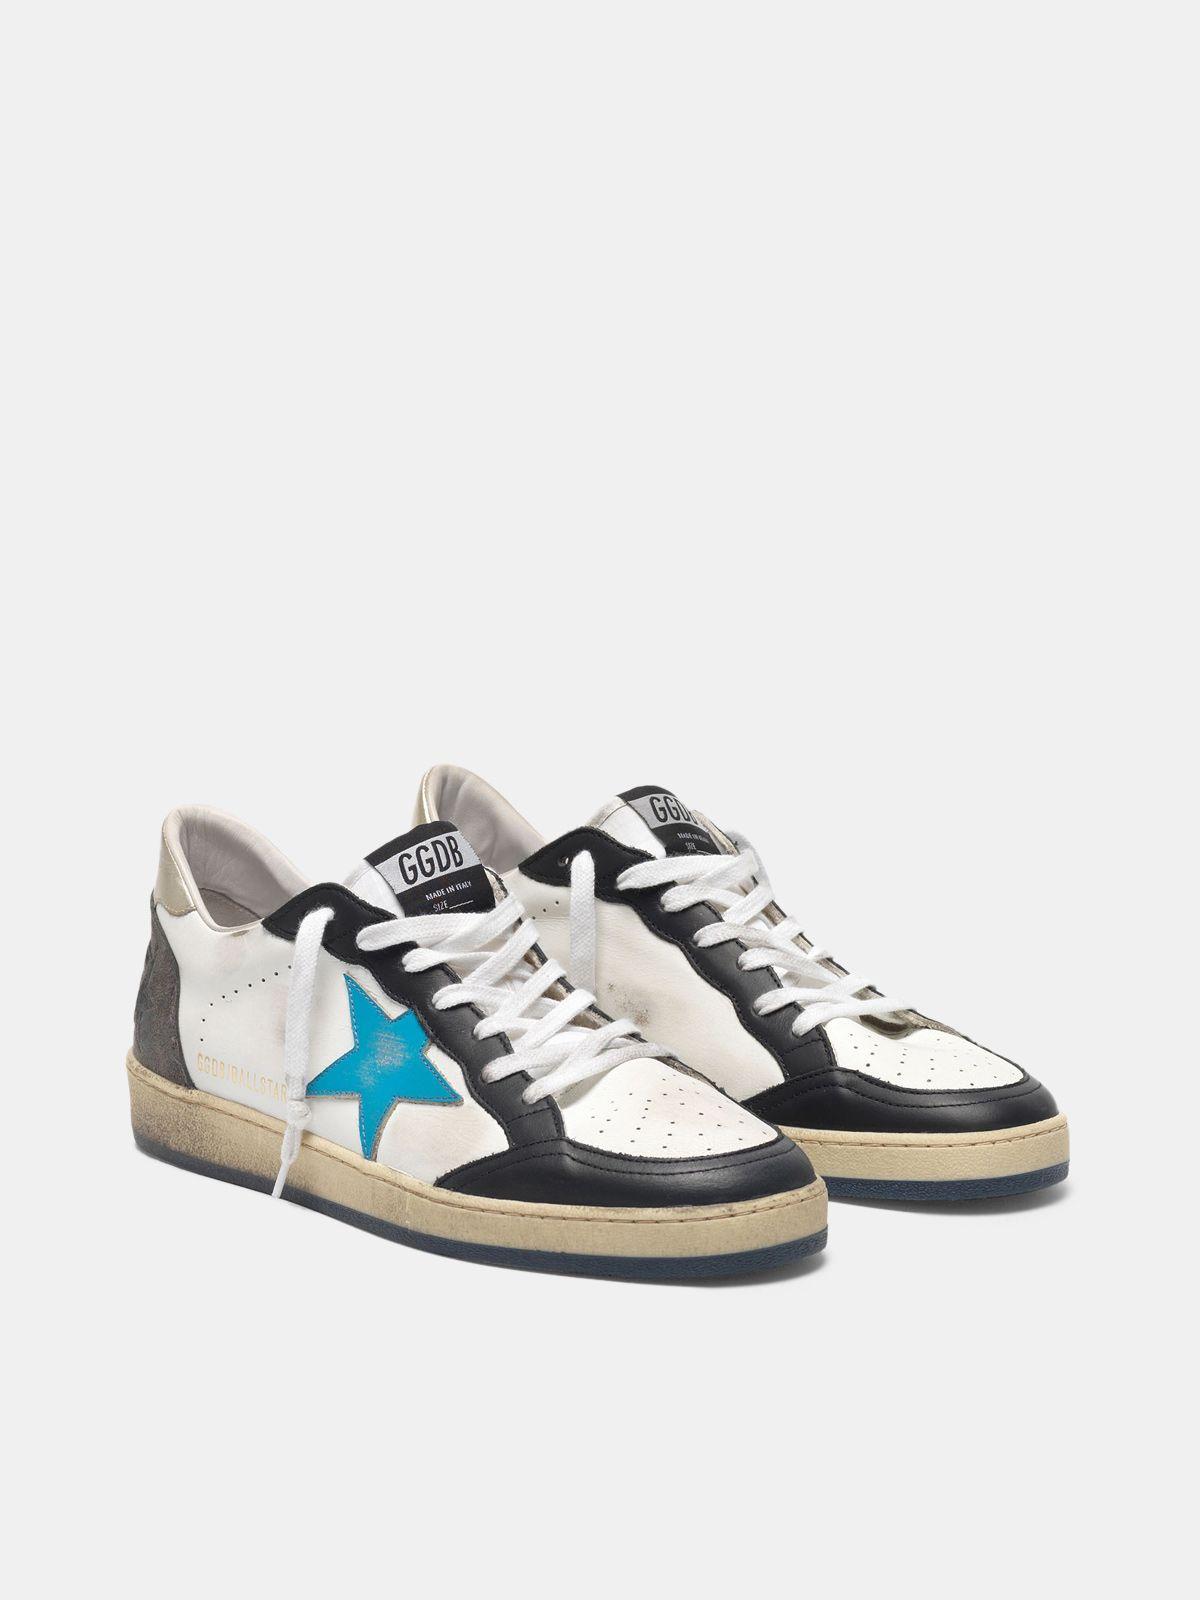 Golden Goose - Ball Star sneakers in leather with metallic heel tab in